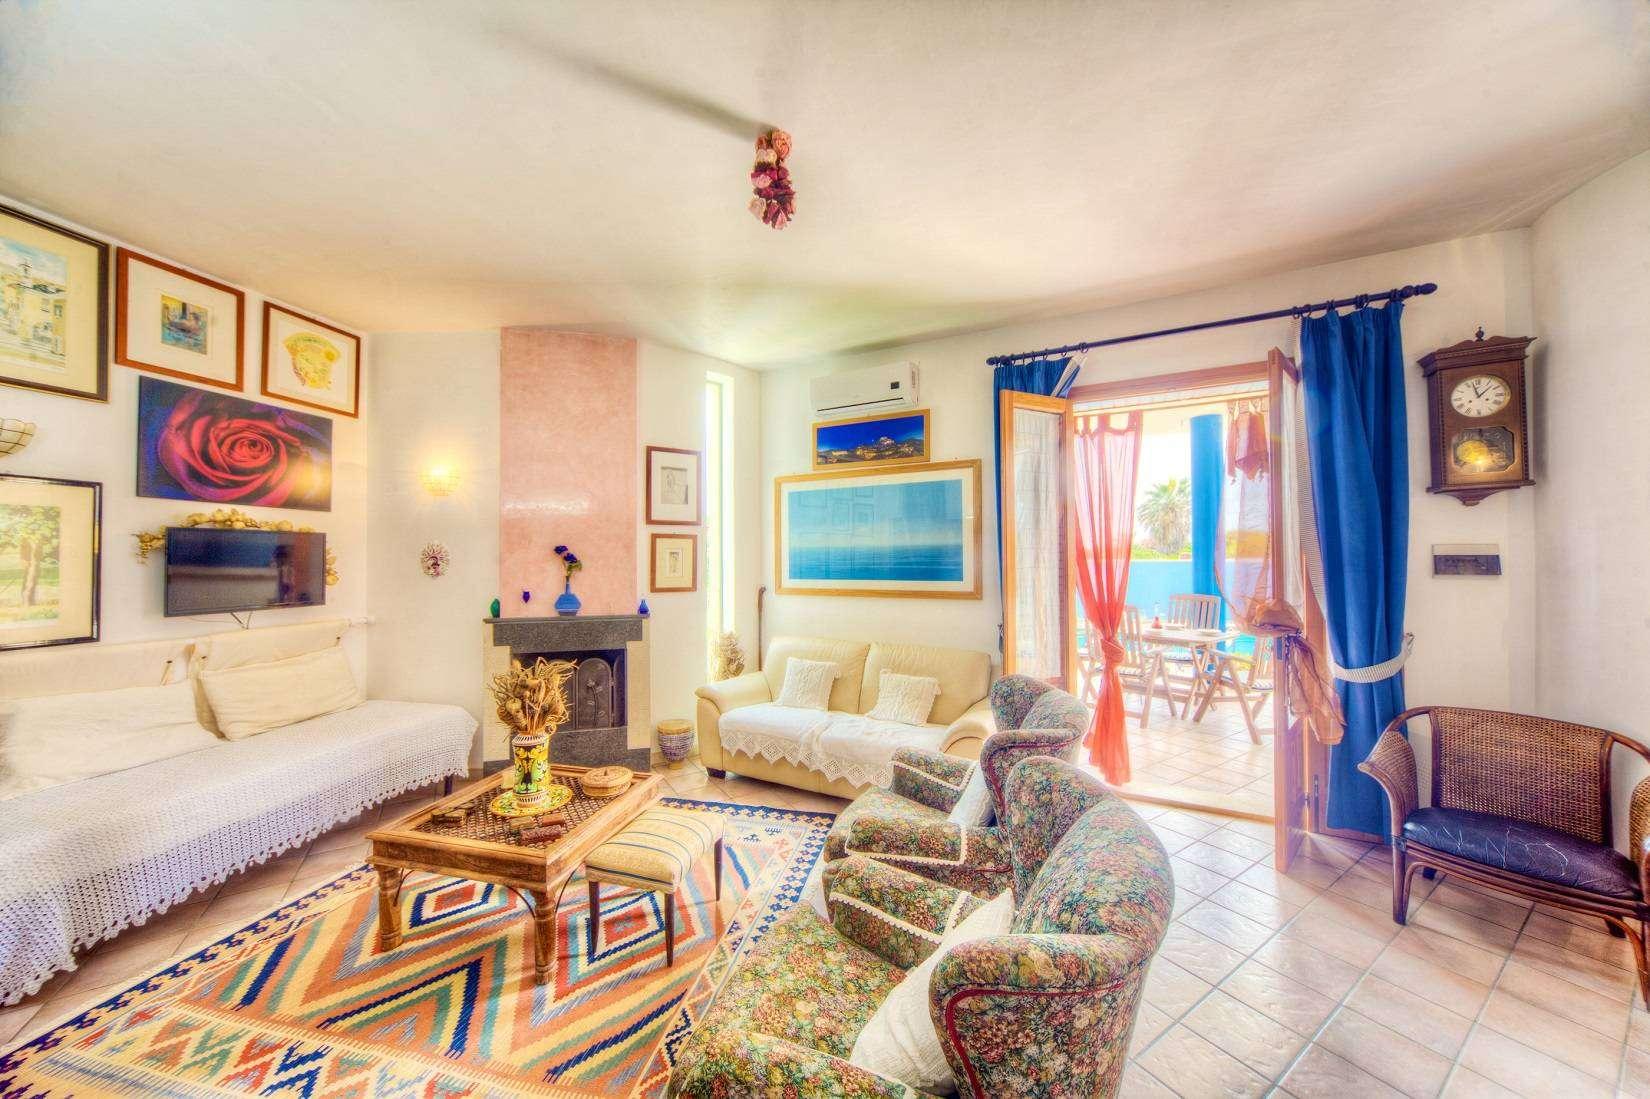 8 Brucarella Living room